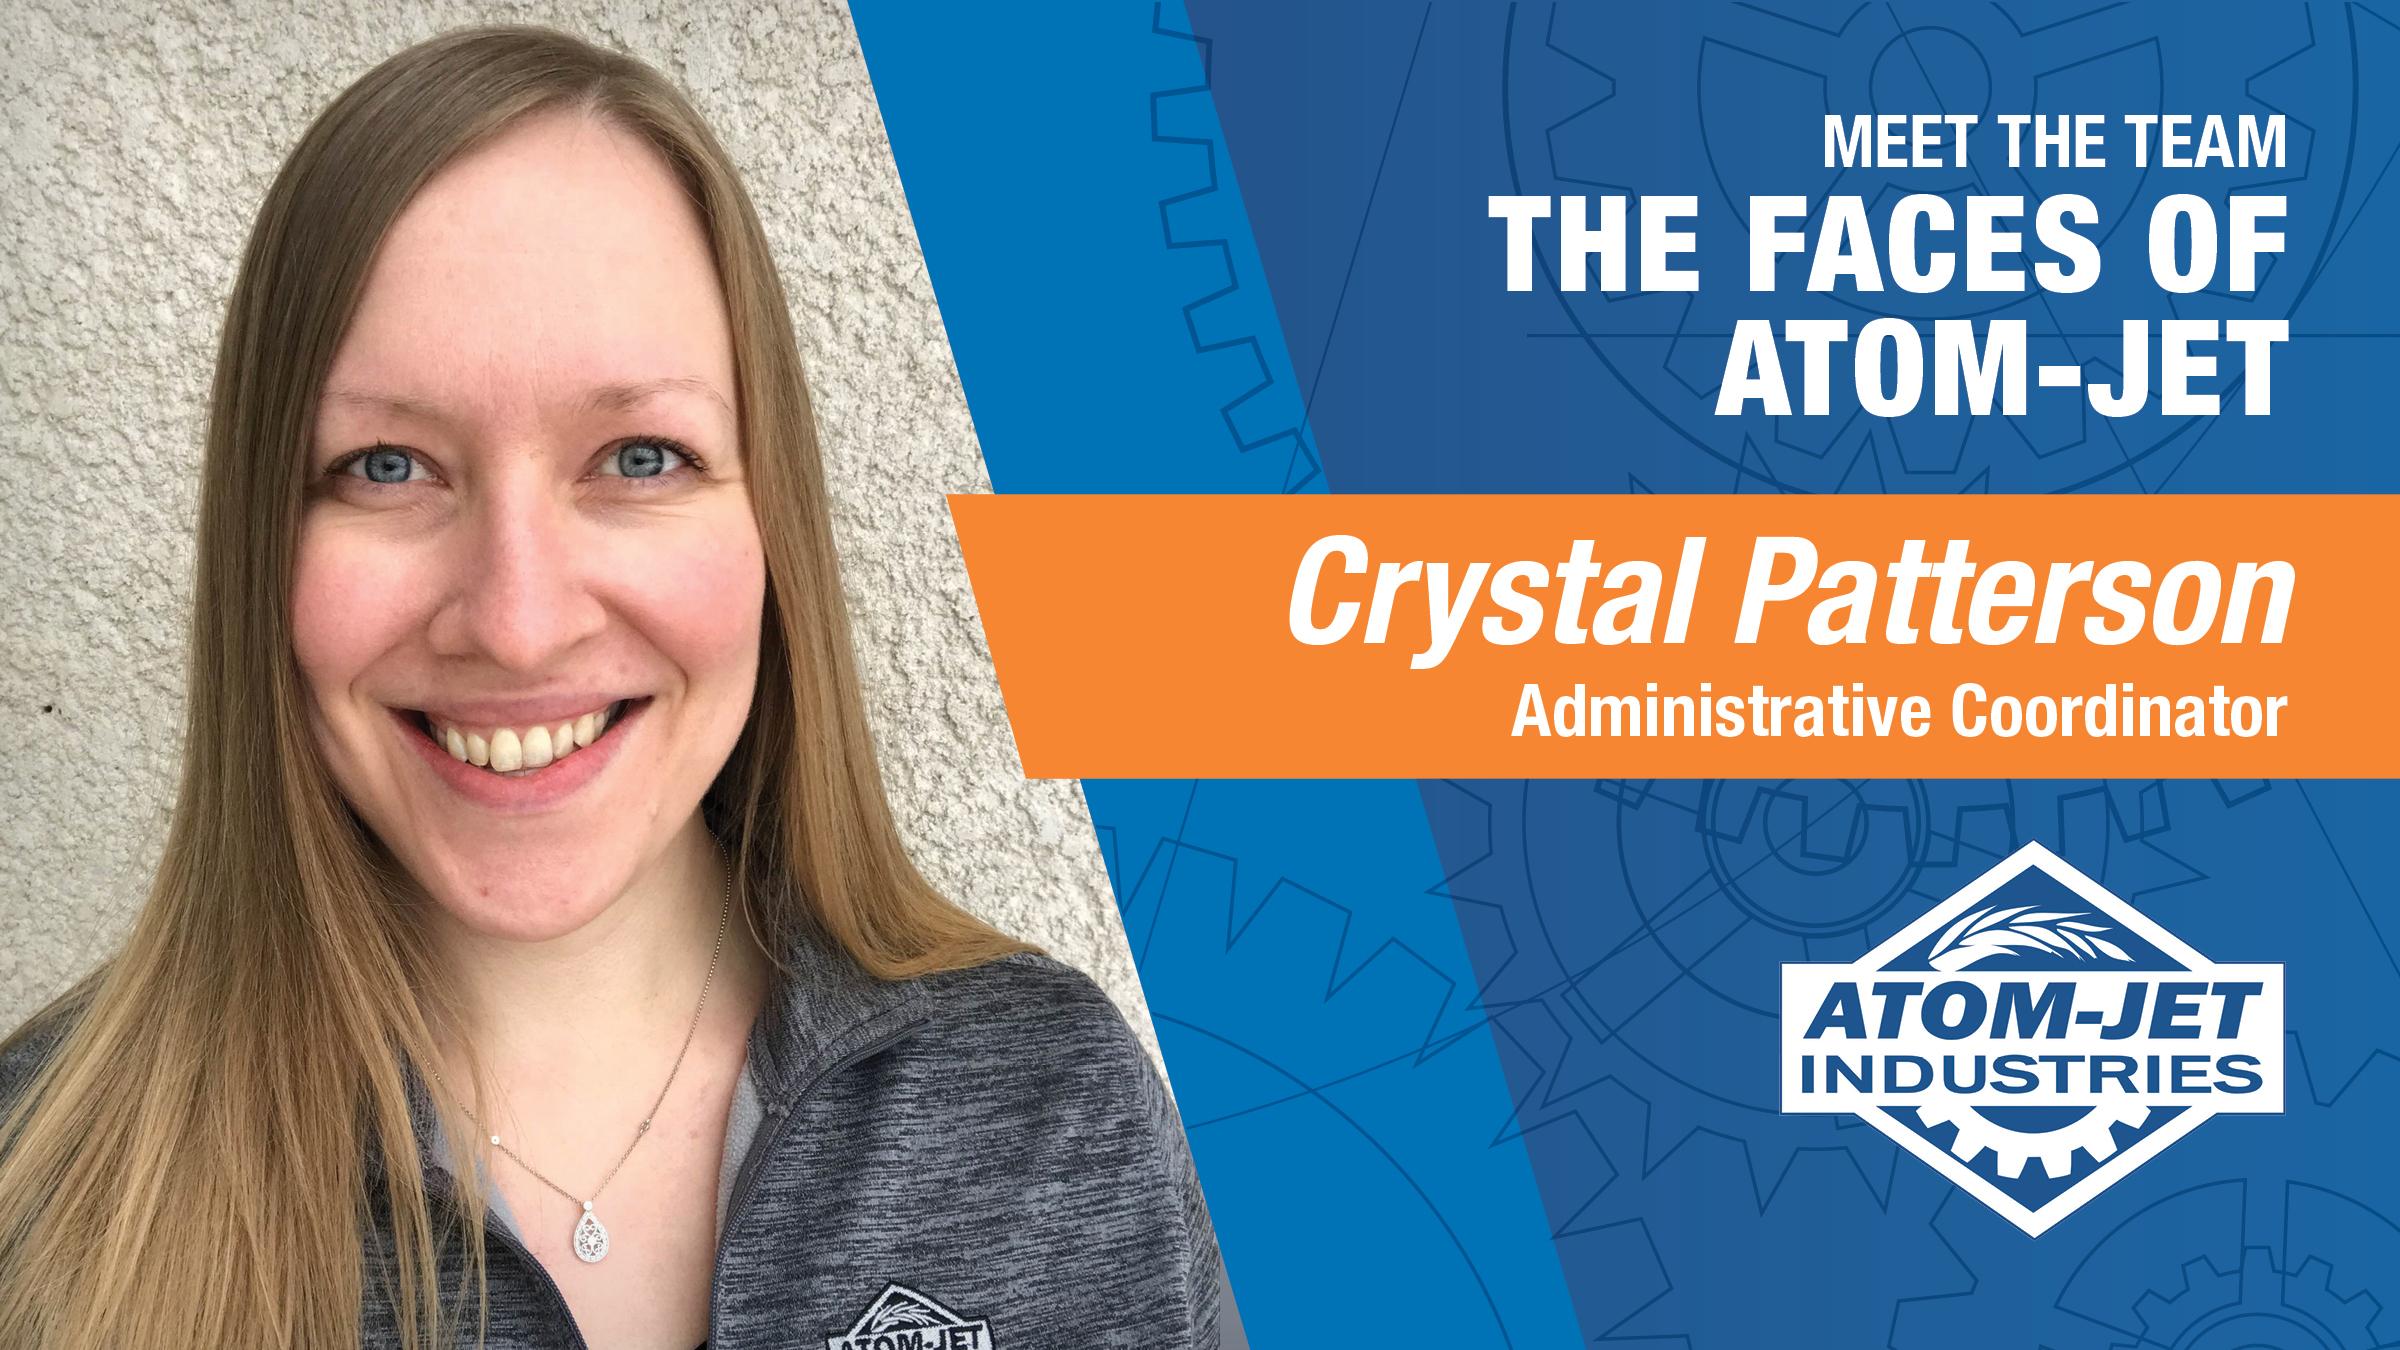 Atom-Jet Team Member, Crystal Patterson, Administrative Coordinator